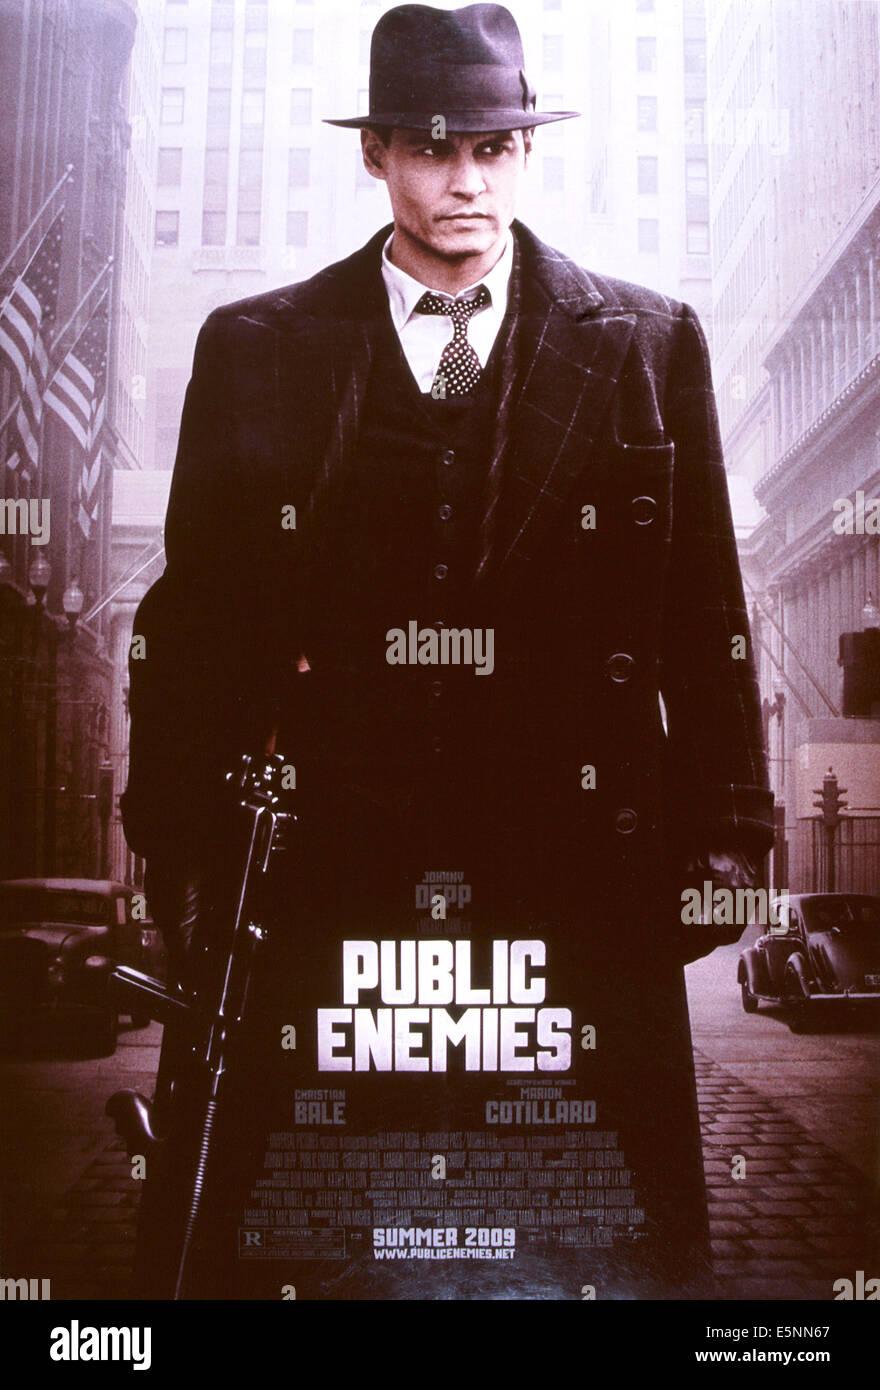 PUBLIC ENEMIES, US poster, Johnny Depp as John Dillinger, 2009. ©Universal/Courtesy Everett Collection - Stock Image